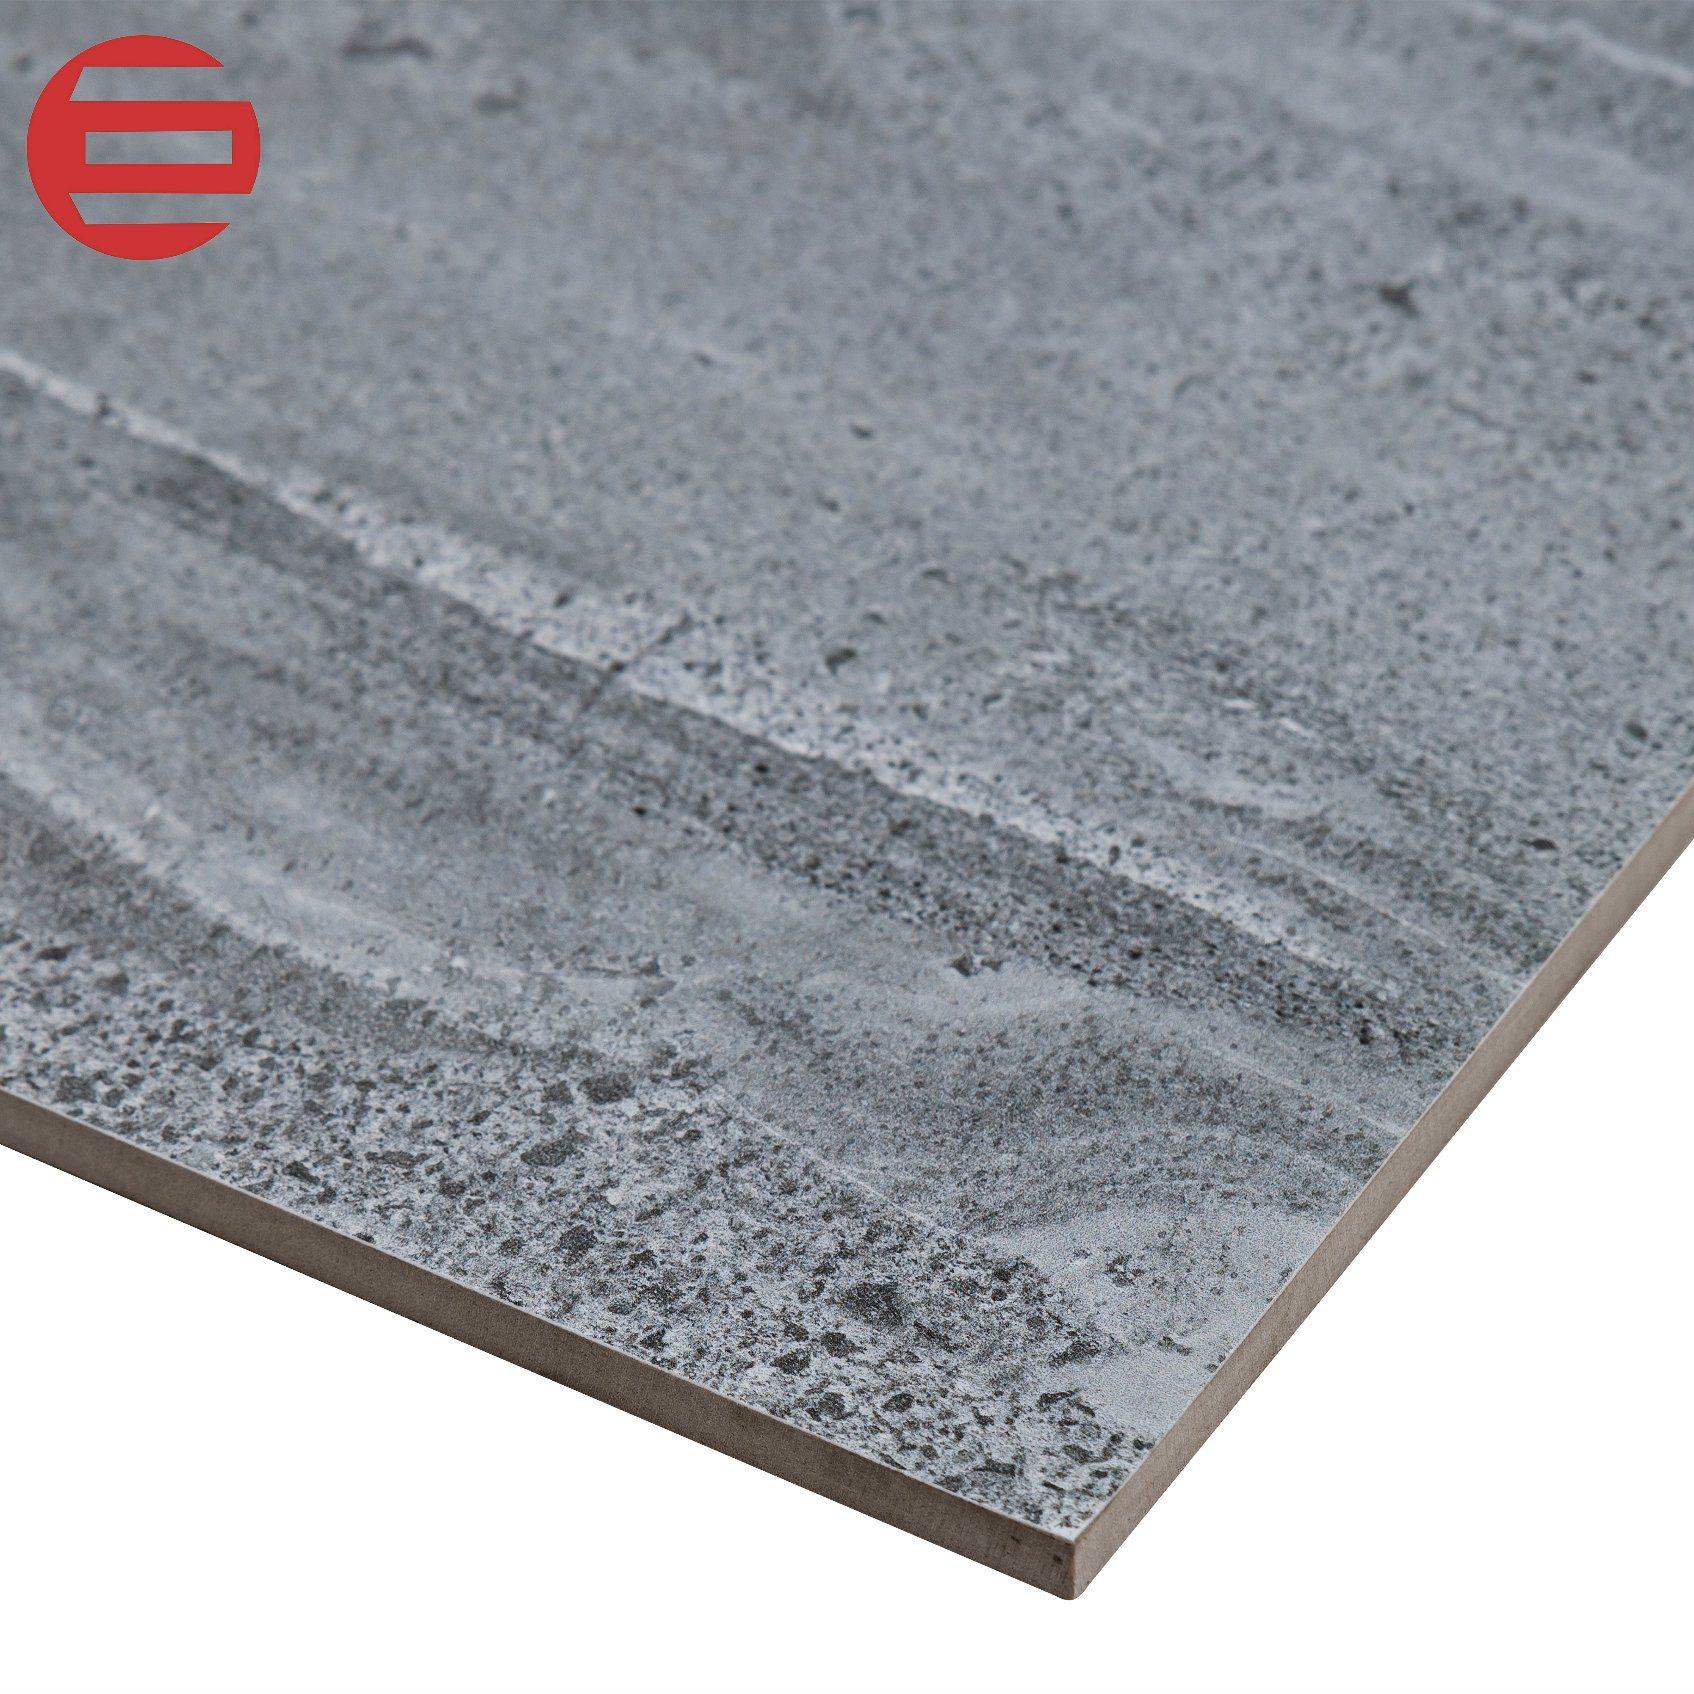 China Building Material 600X600mm Glazed Tile Rustic Porcelain ...